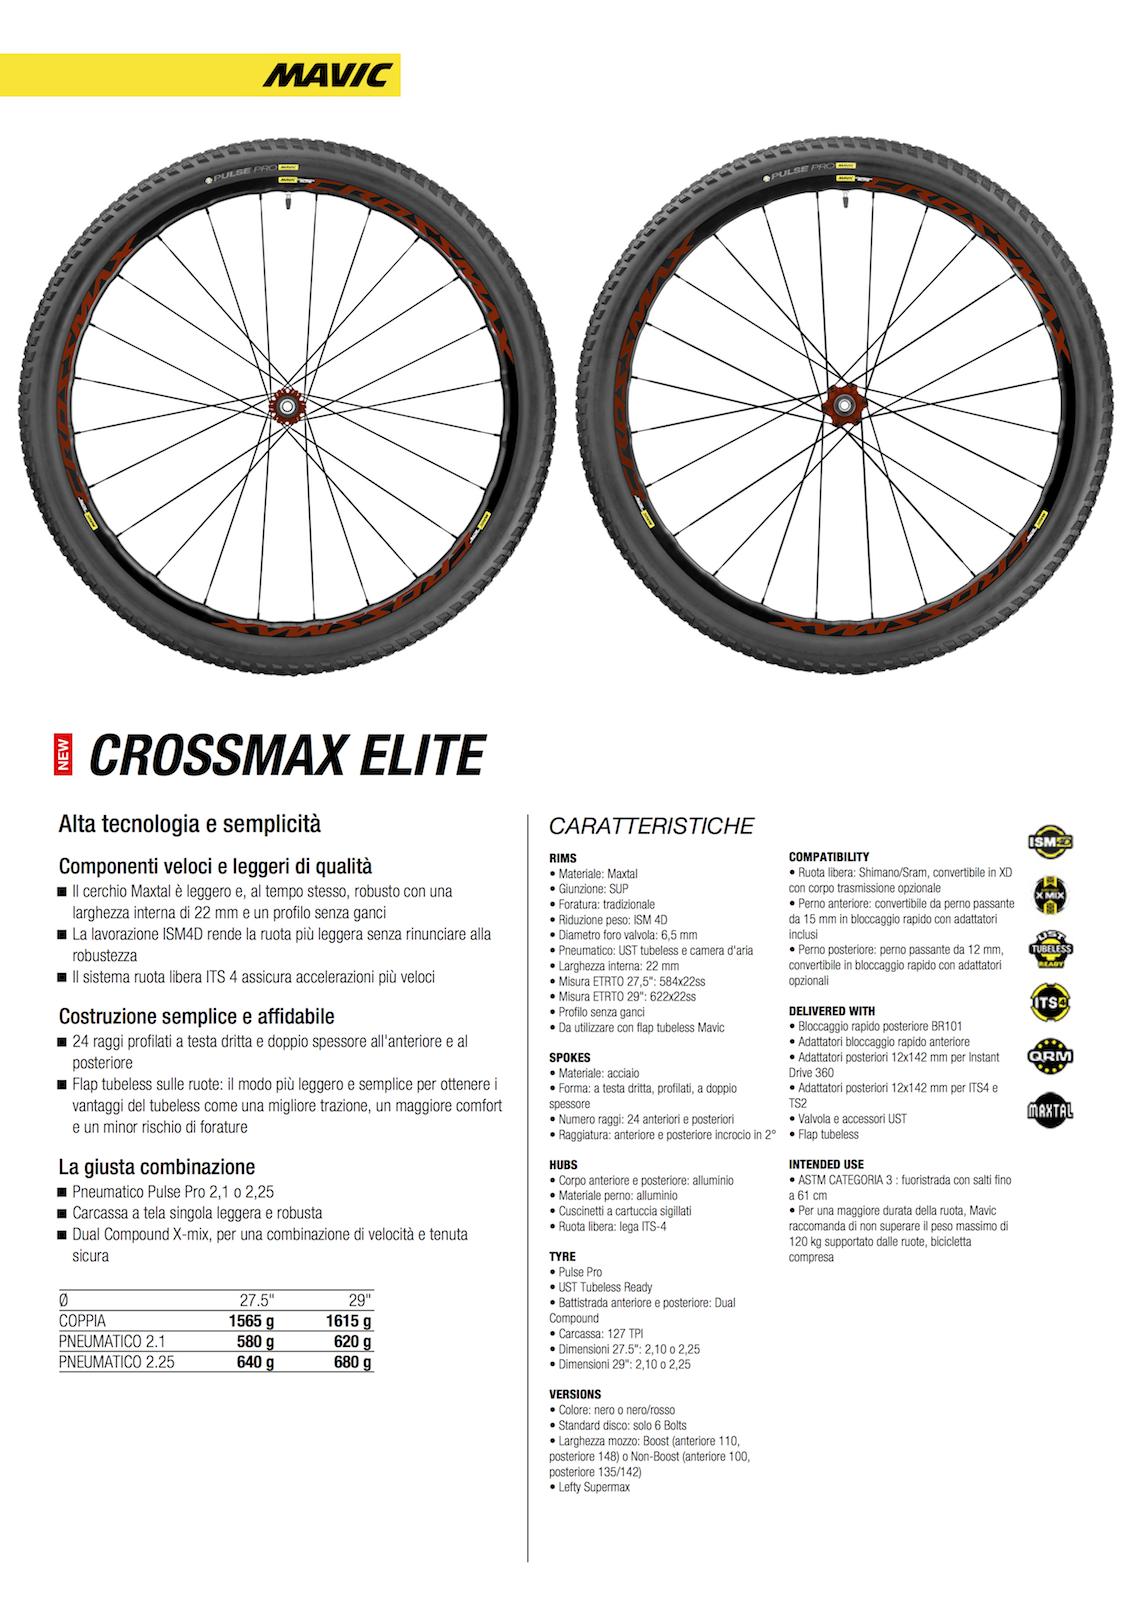 F55002_Crossmax_Elite